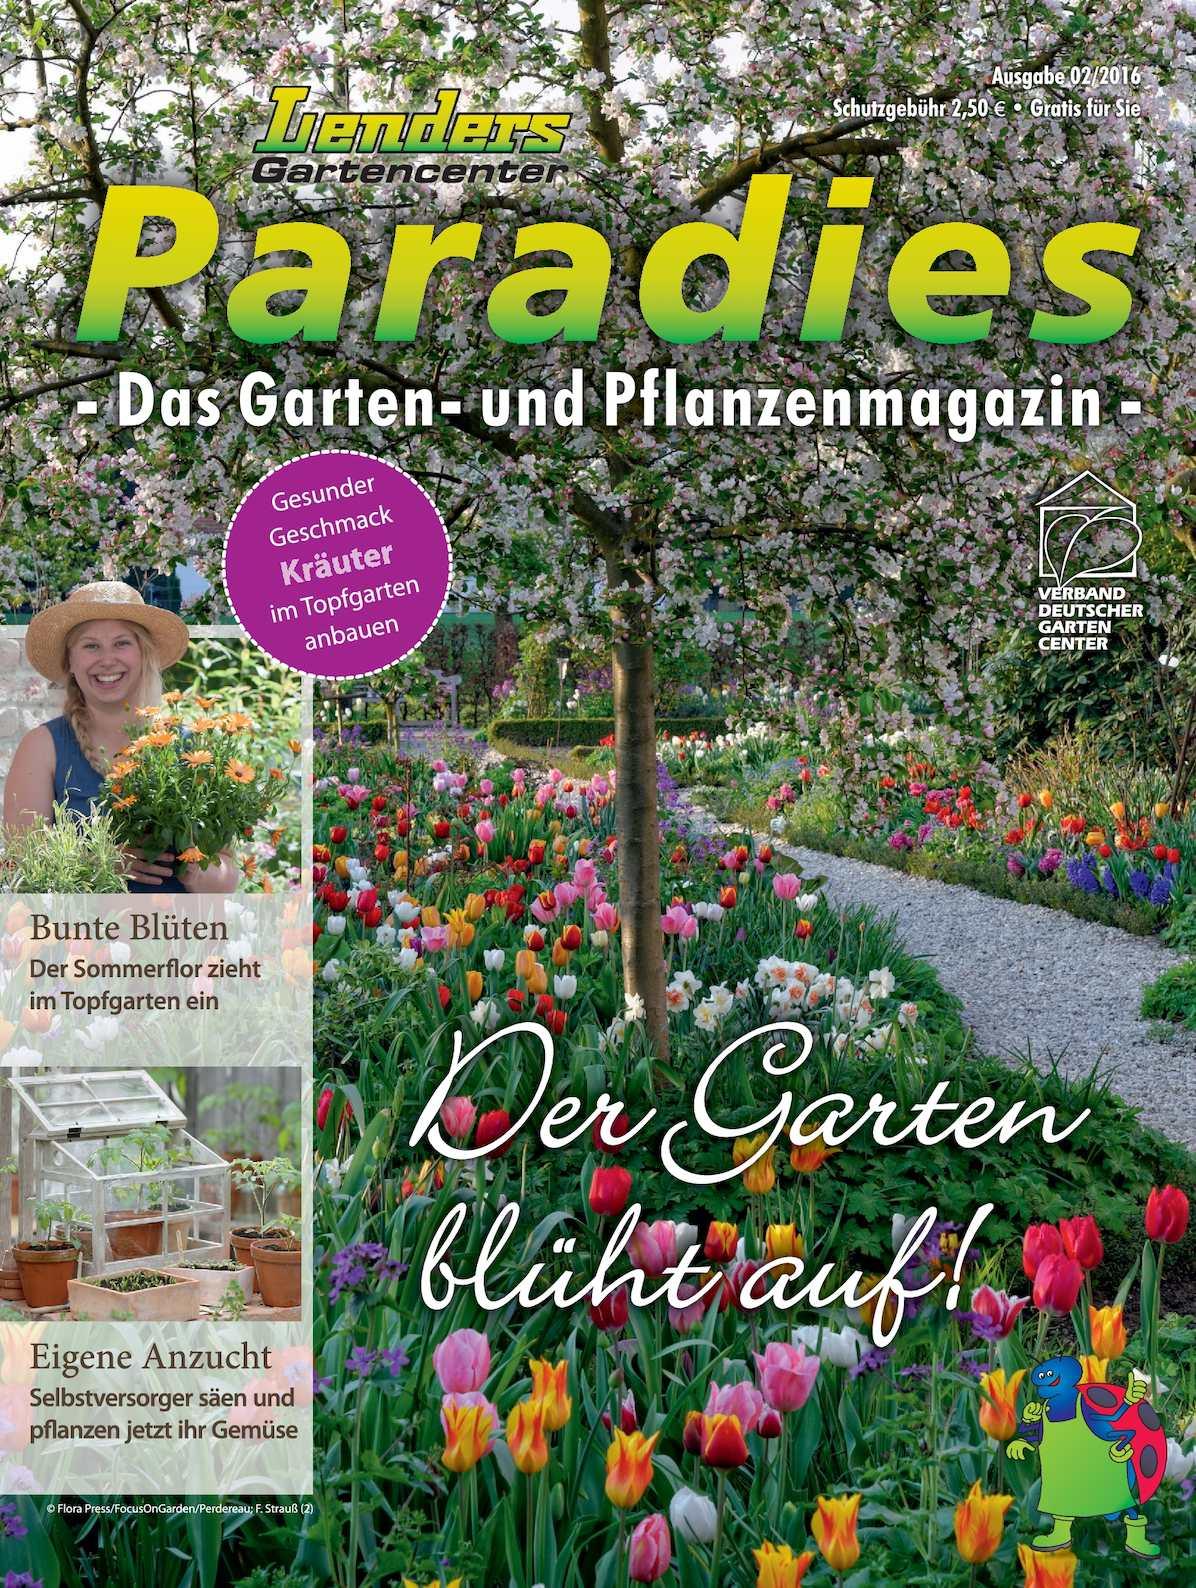 Calaméo   Lenders Gartenparadies 02/2016